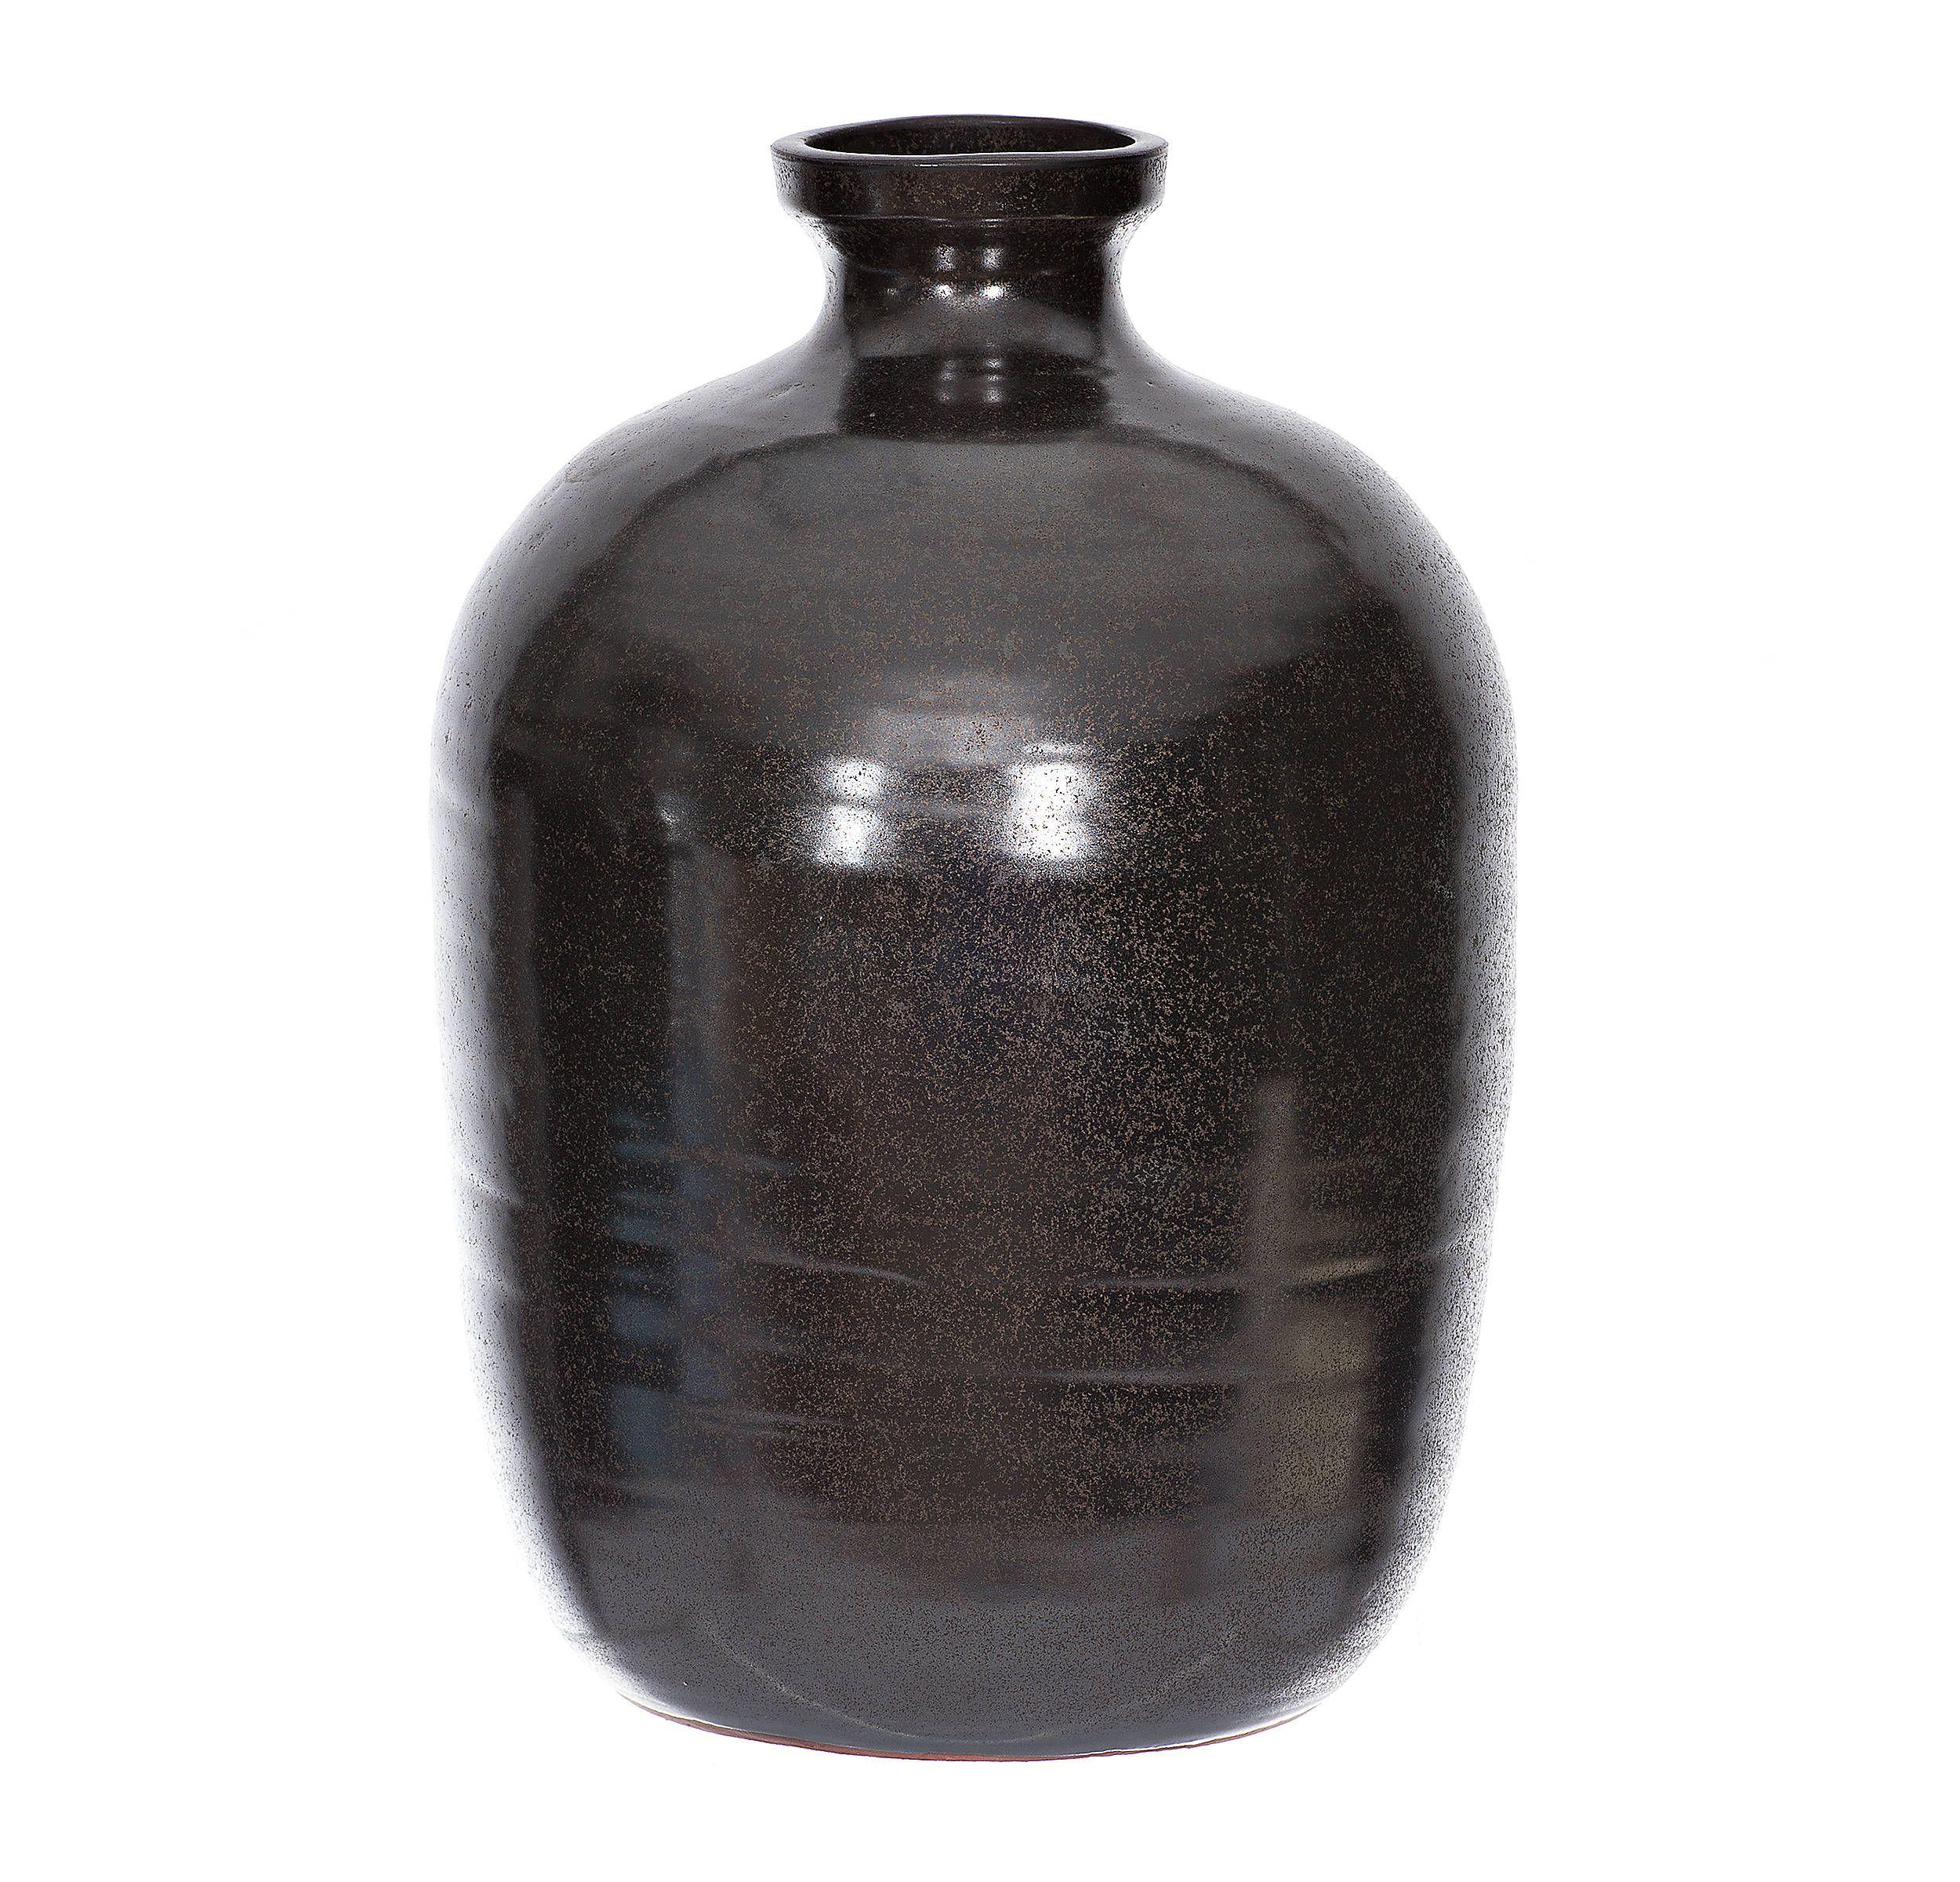 Dark Luster Ceramic Vase Ceramic Vase Farmhouse Vases Mason